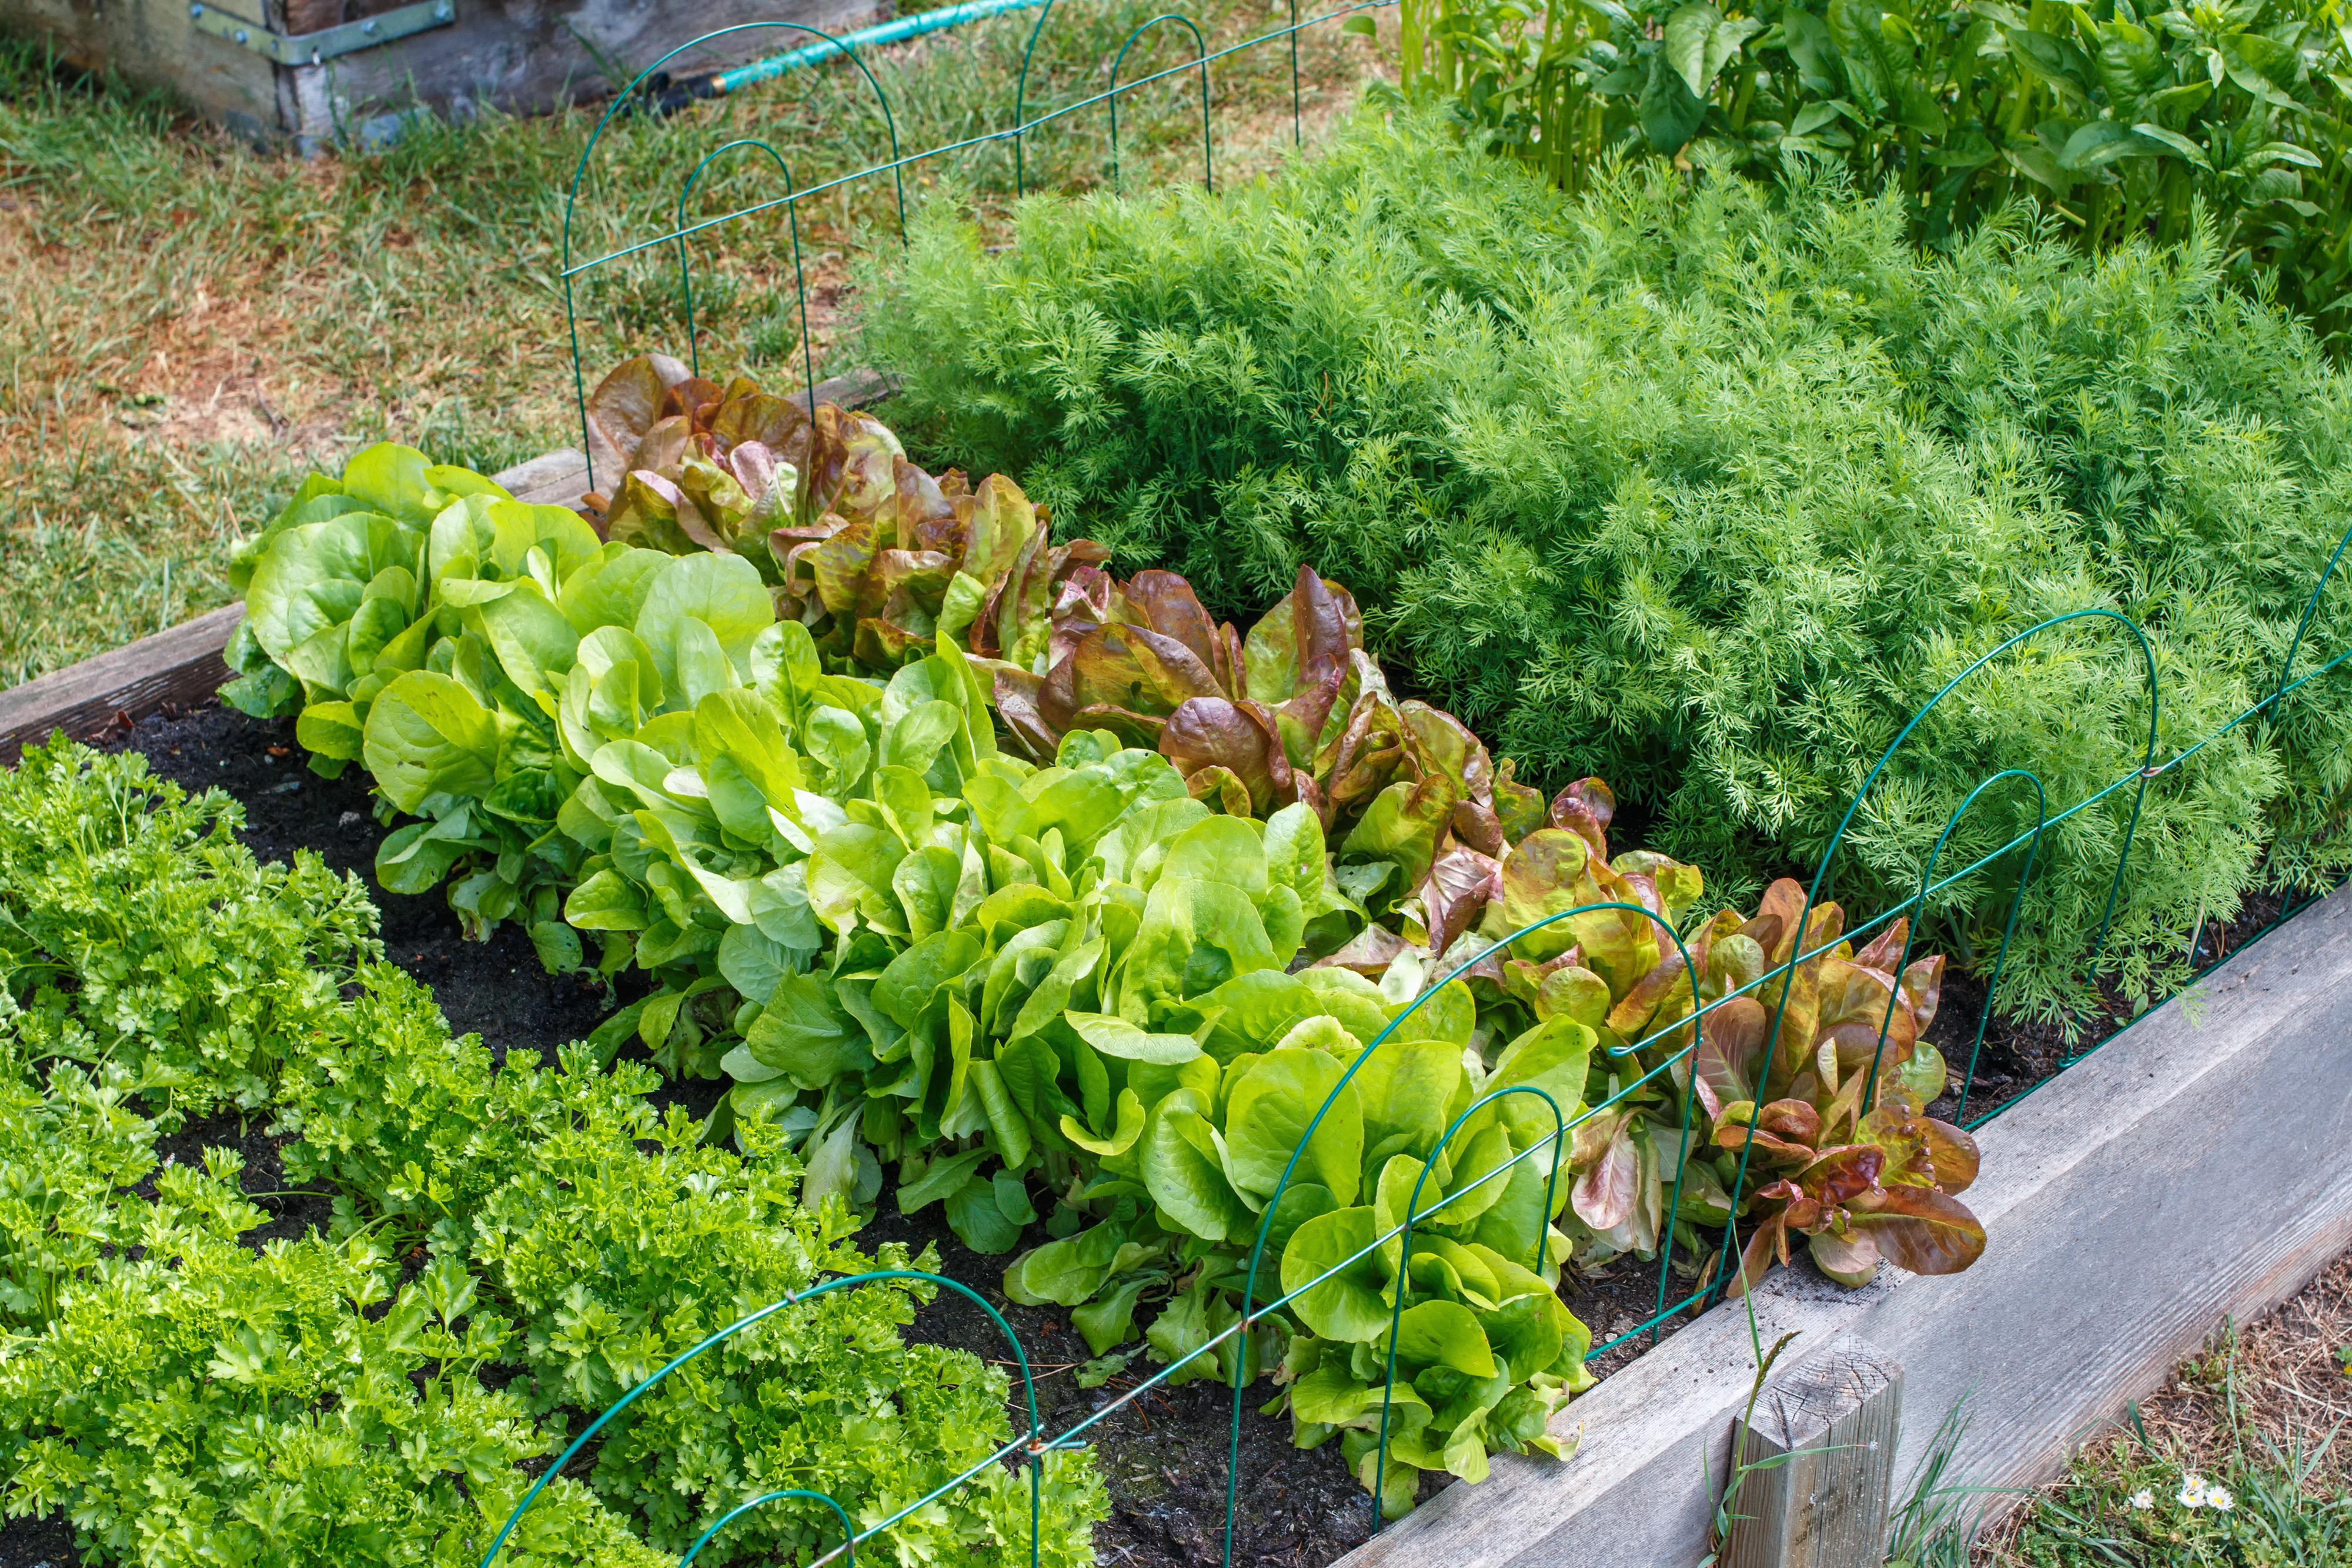 microBIOMETER® Soil Testing in New Zealand garden community